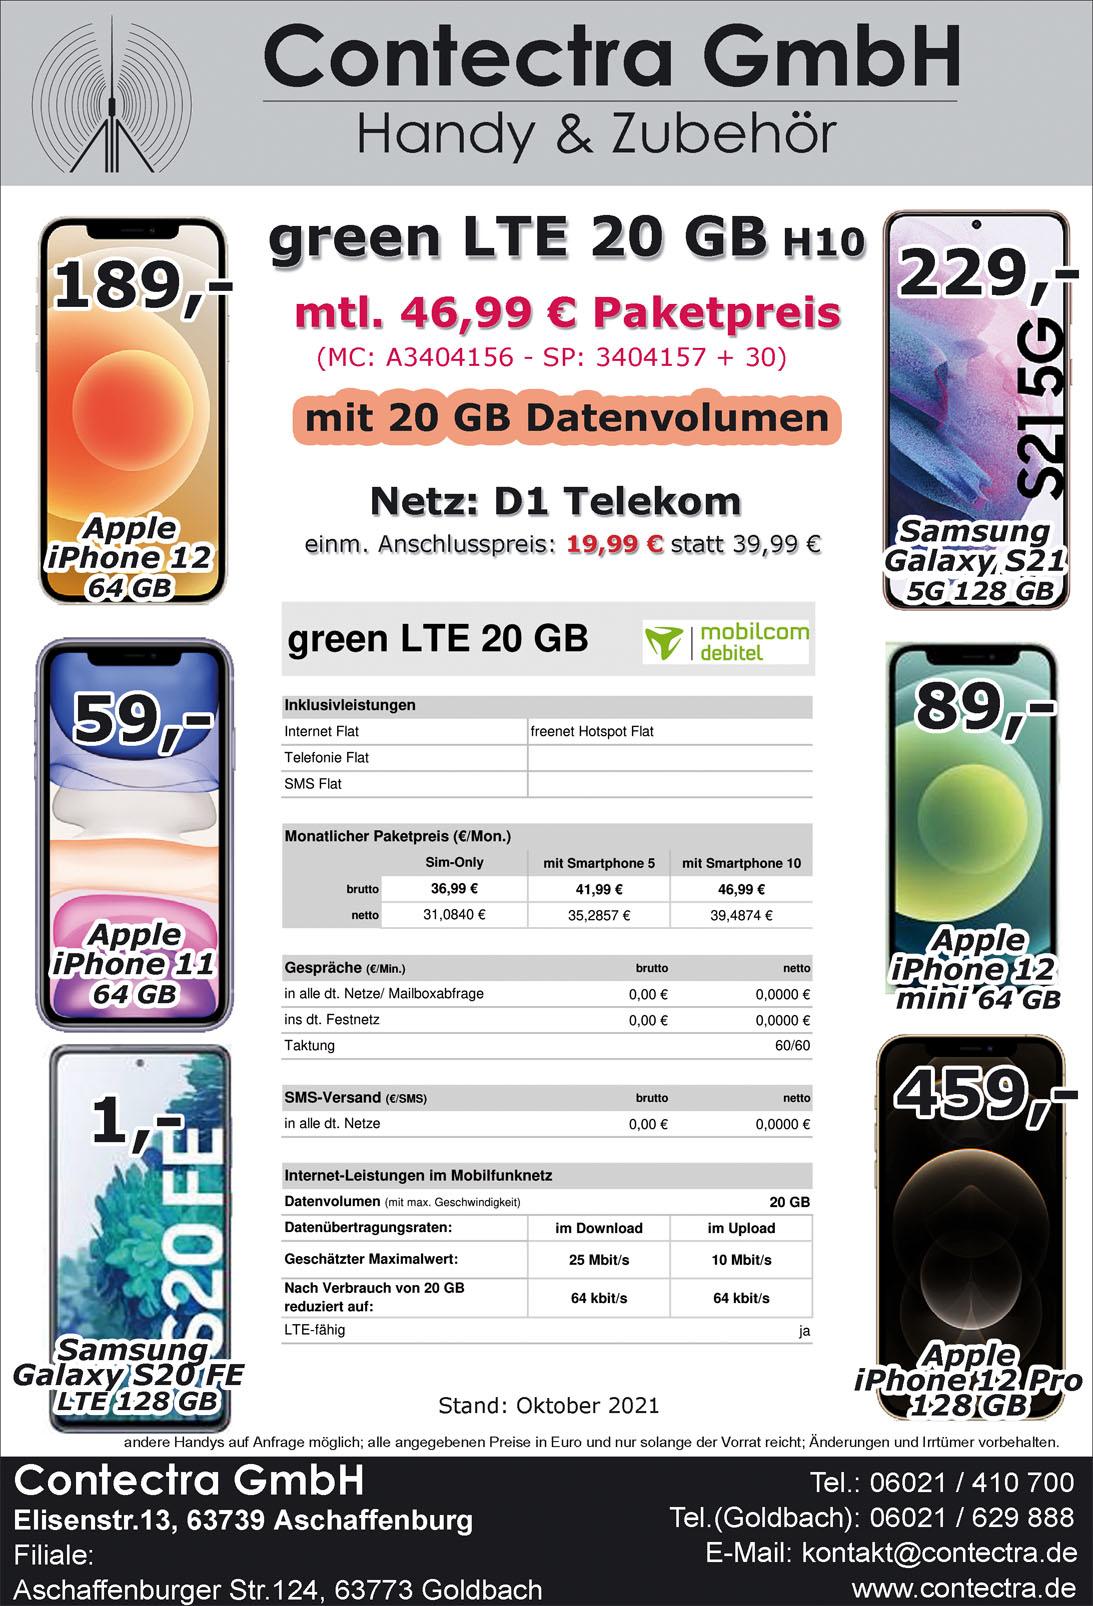 green LTE 20 GB H10 Okt21 Kopie